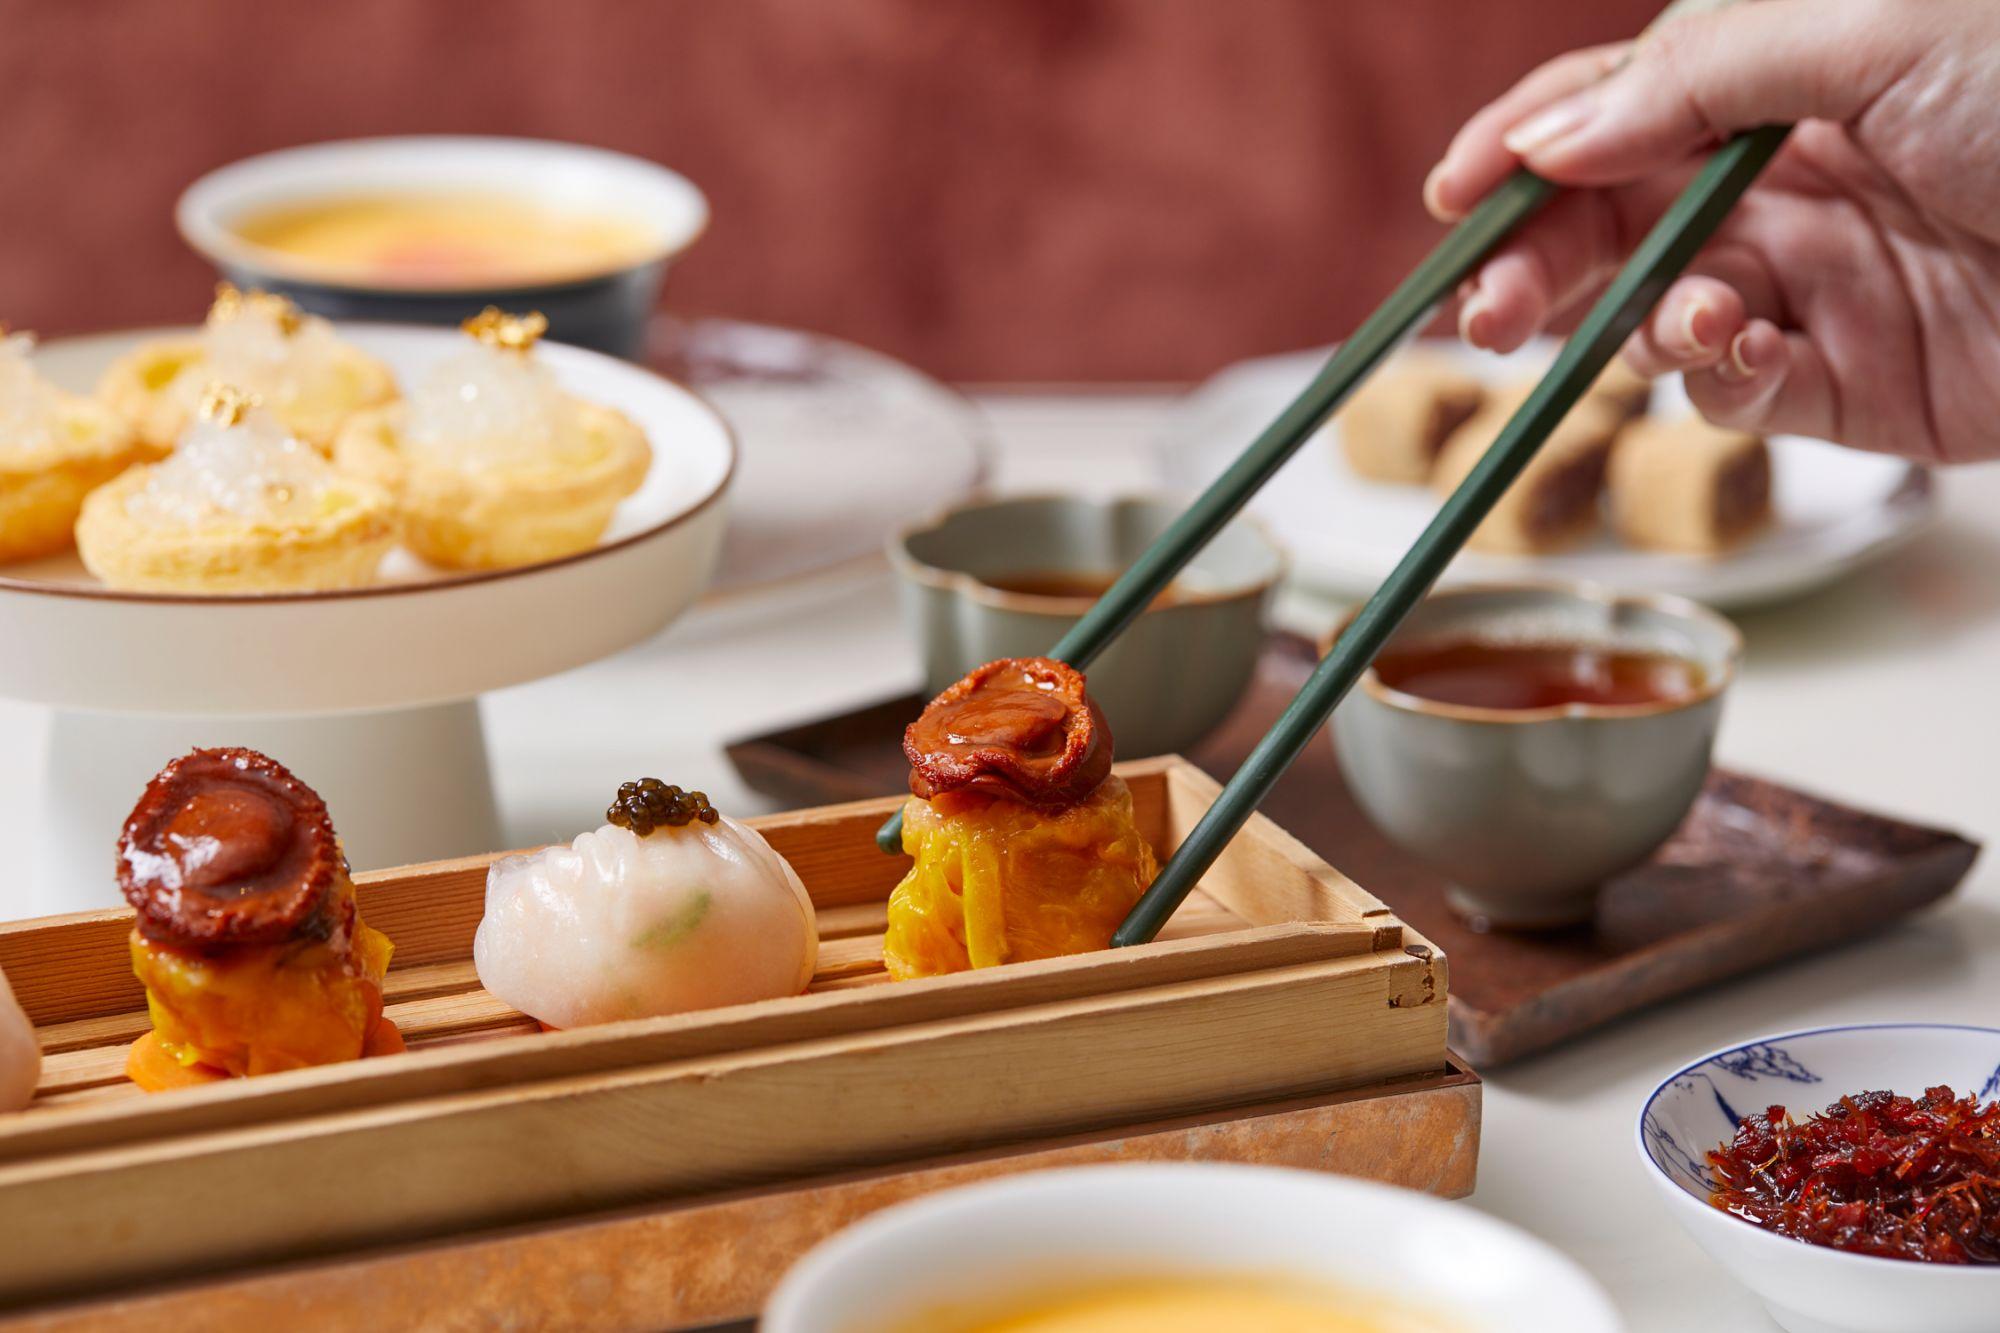 Holt's Café's New Menu Marries Dim Sum Favourites With Afternoon Tea